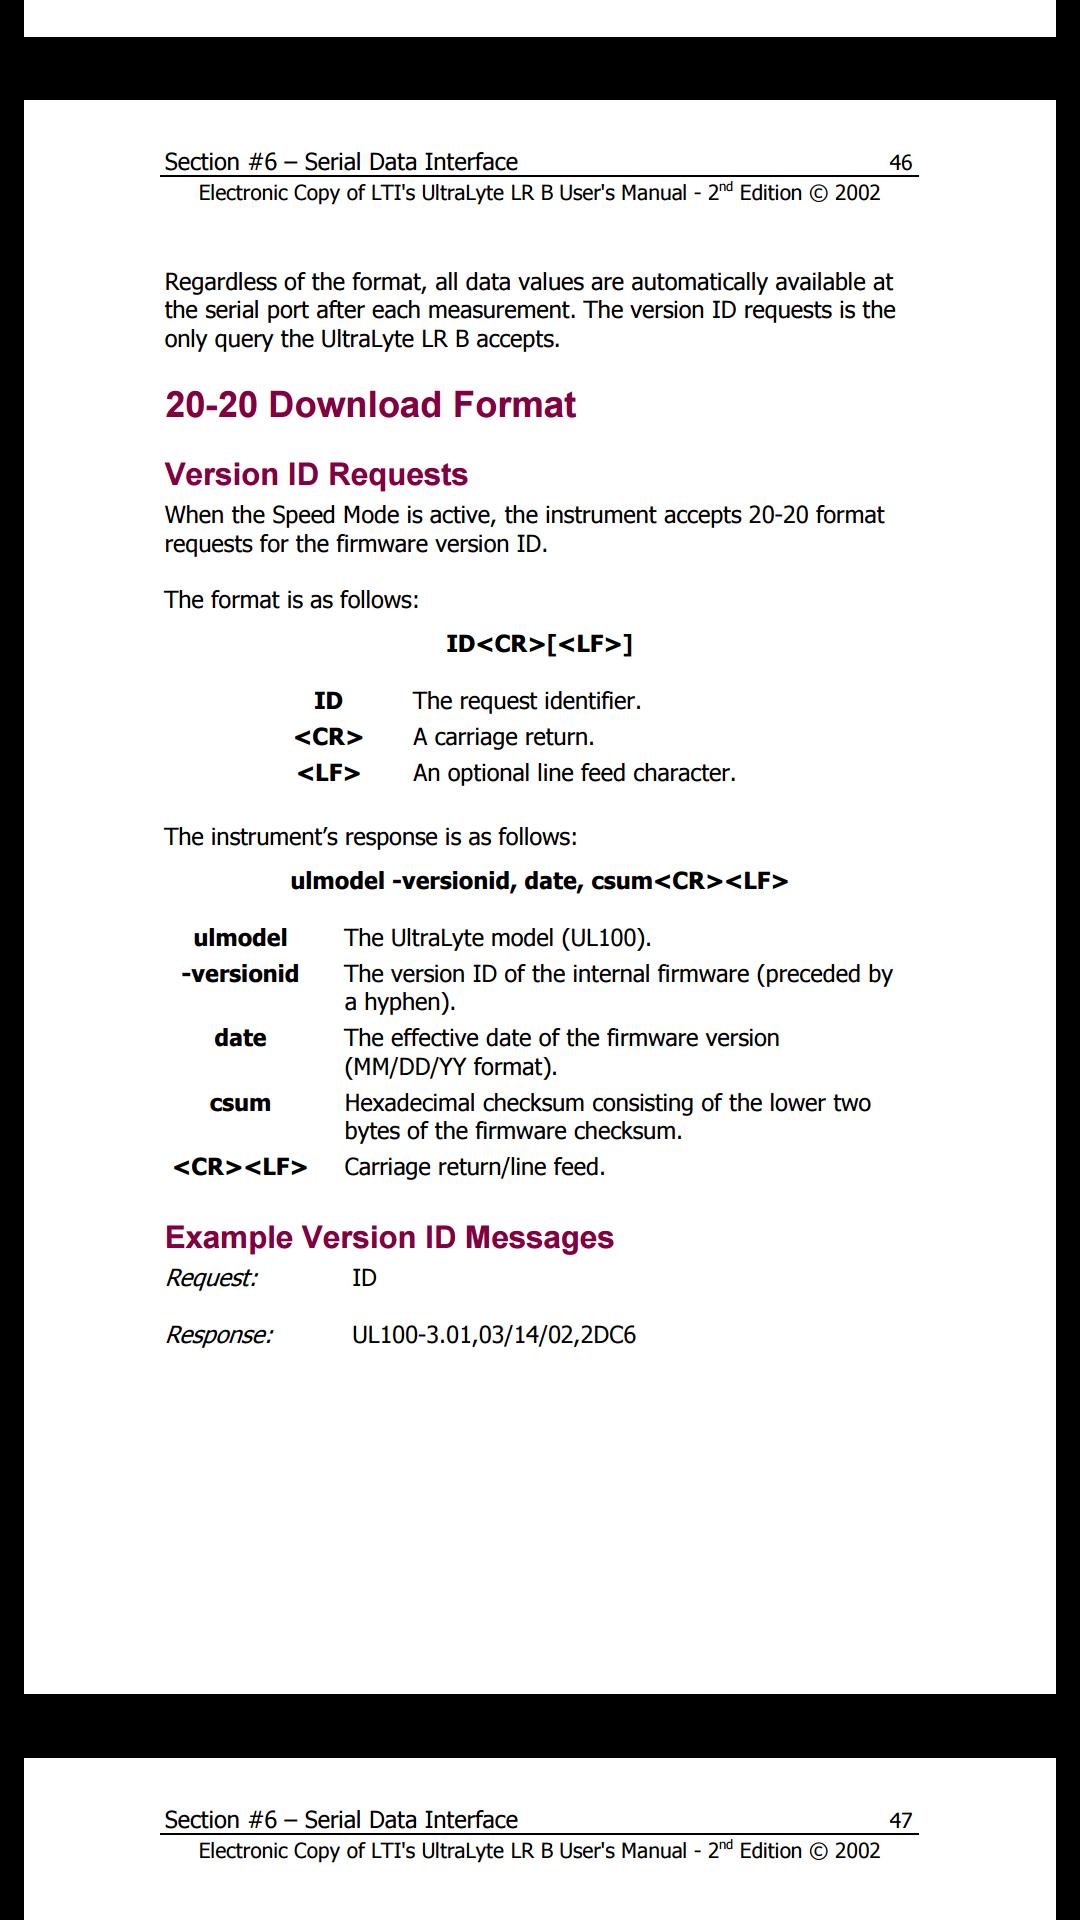 http://www.bentcop.biz/Screenshot_2017-04-11-23-21-58.png